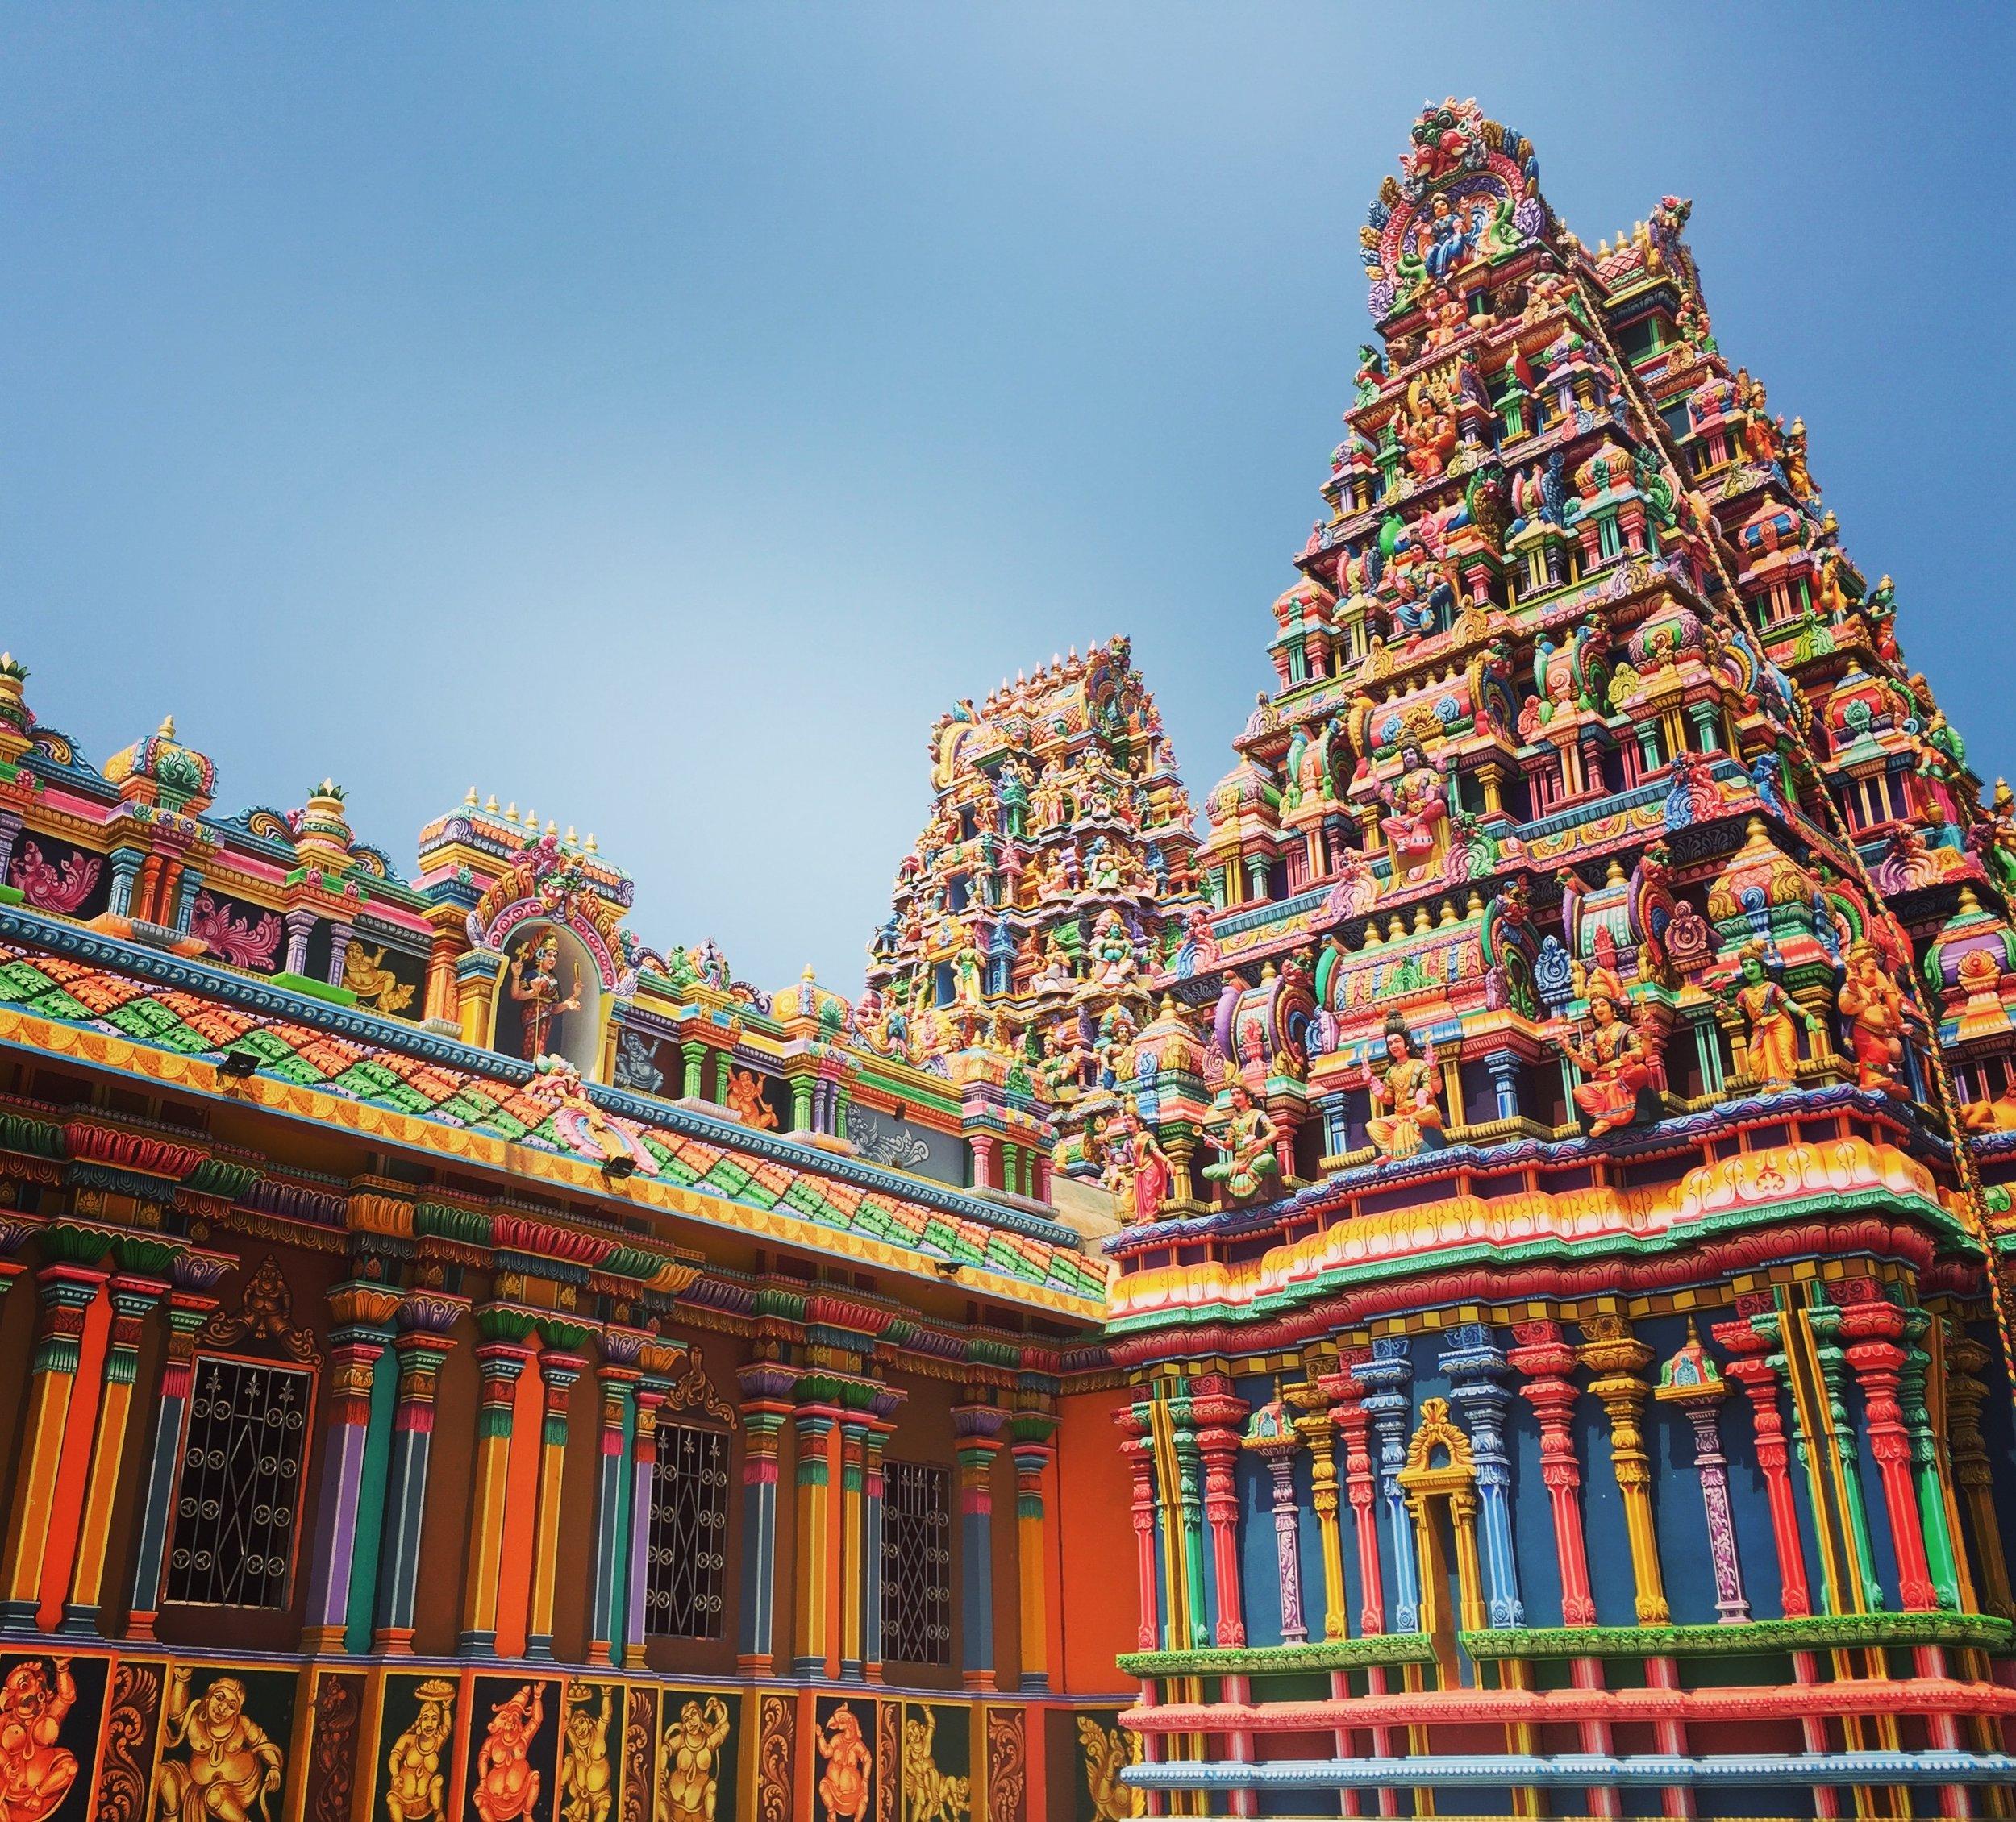 The Pathirakali Amman Temple (aka Kali Kovil) in Trincomalee, Sri Lanka.